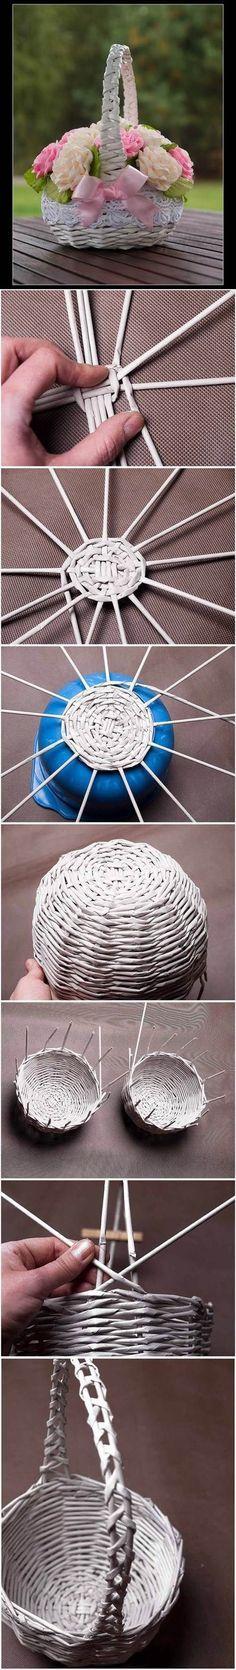 DIY Newspaper Tubes Weaving Basket   iCreativeIdeas.com Follow Us on Facebook --> https://www.facebook.com/icreativeideas: